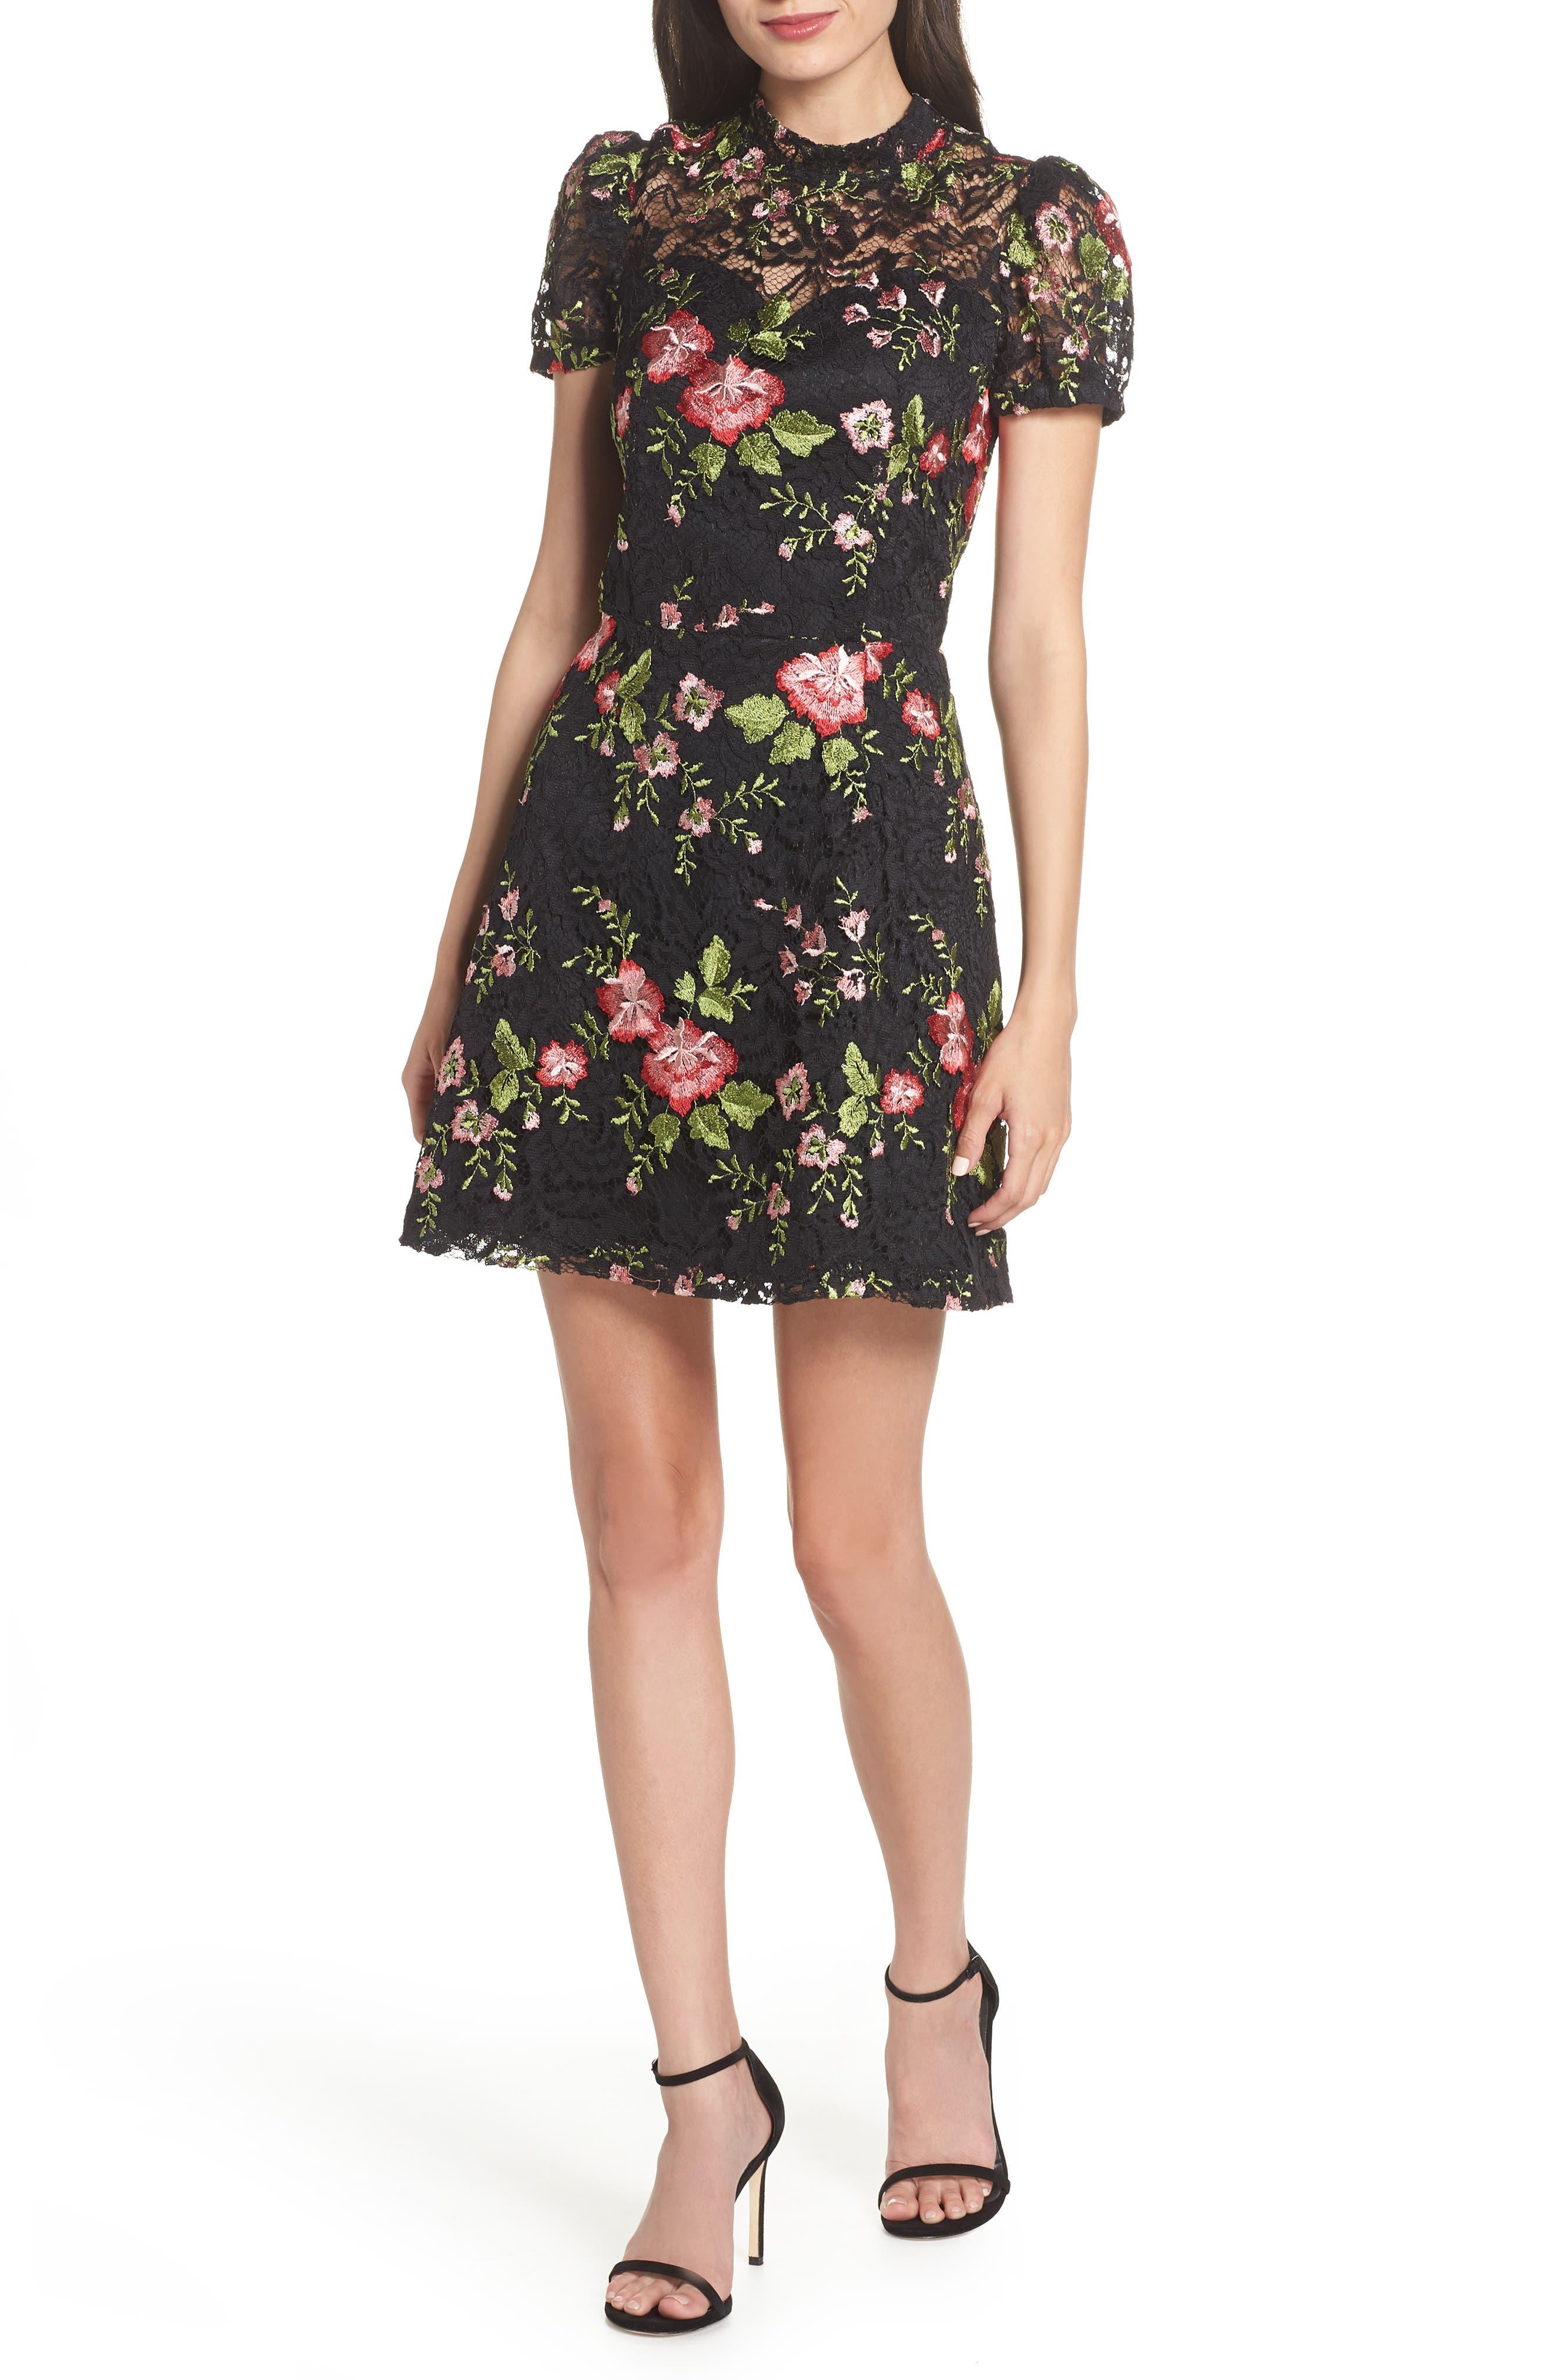 Adelyn Rae Maribel Lace Fit & Flare Dress, Black